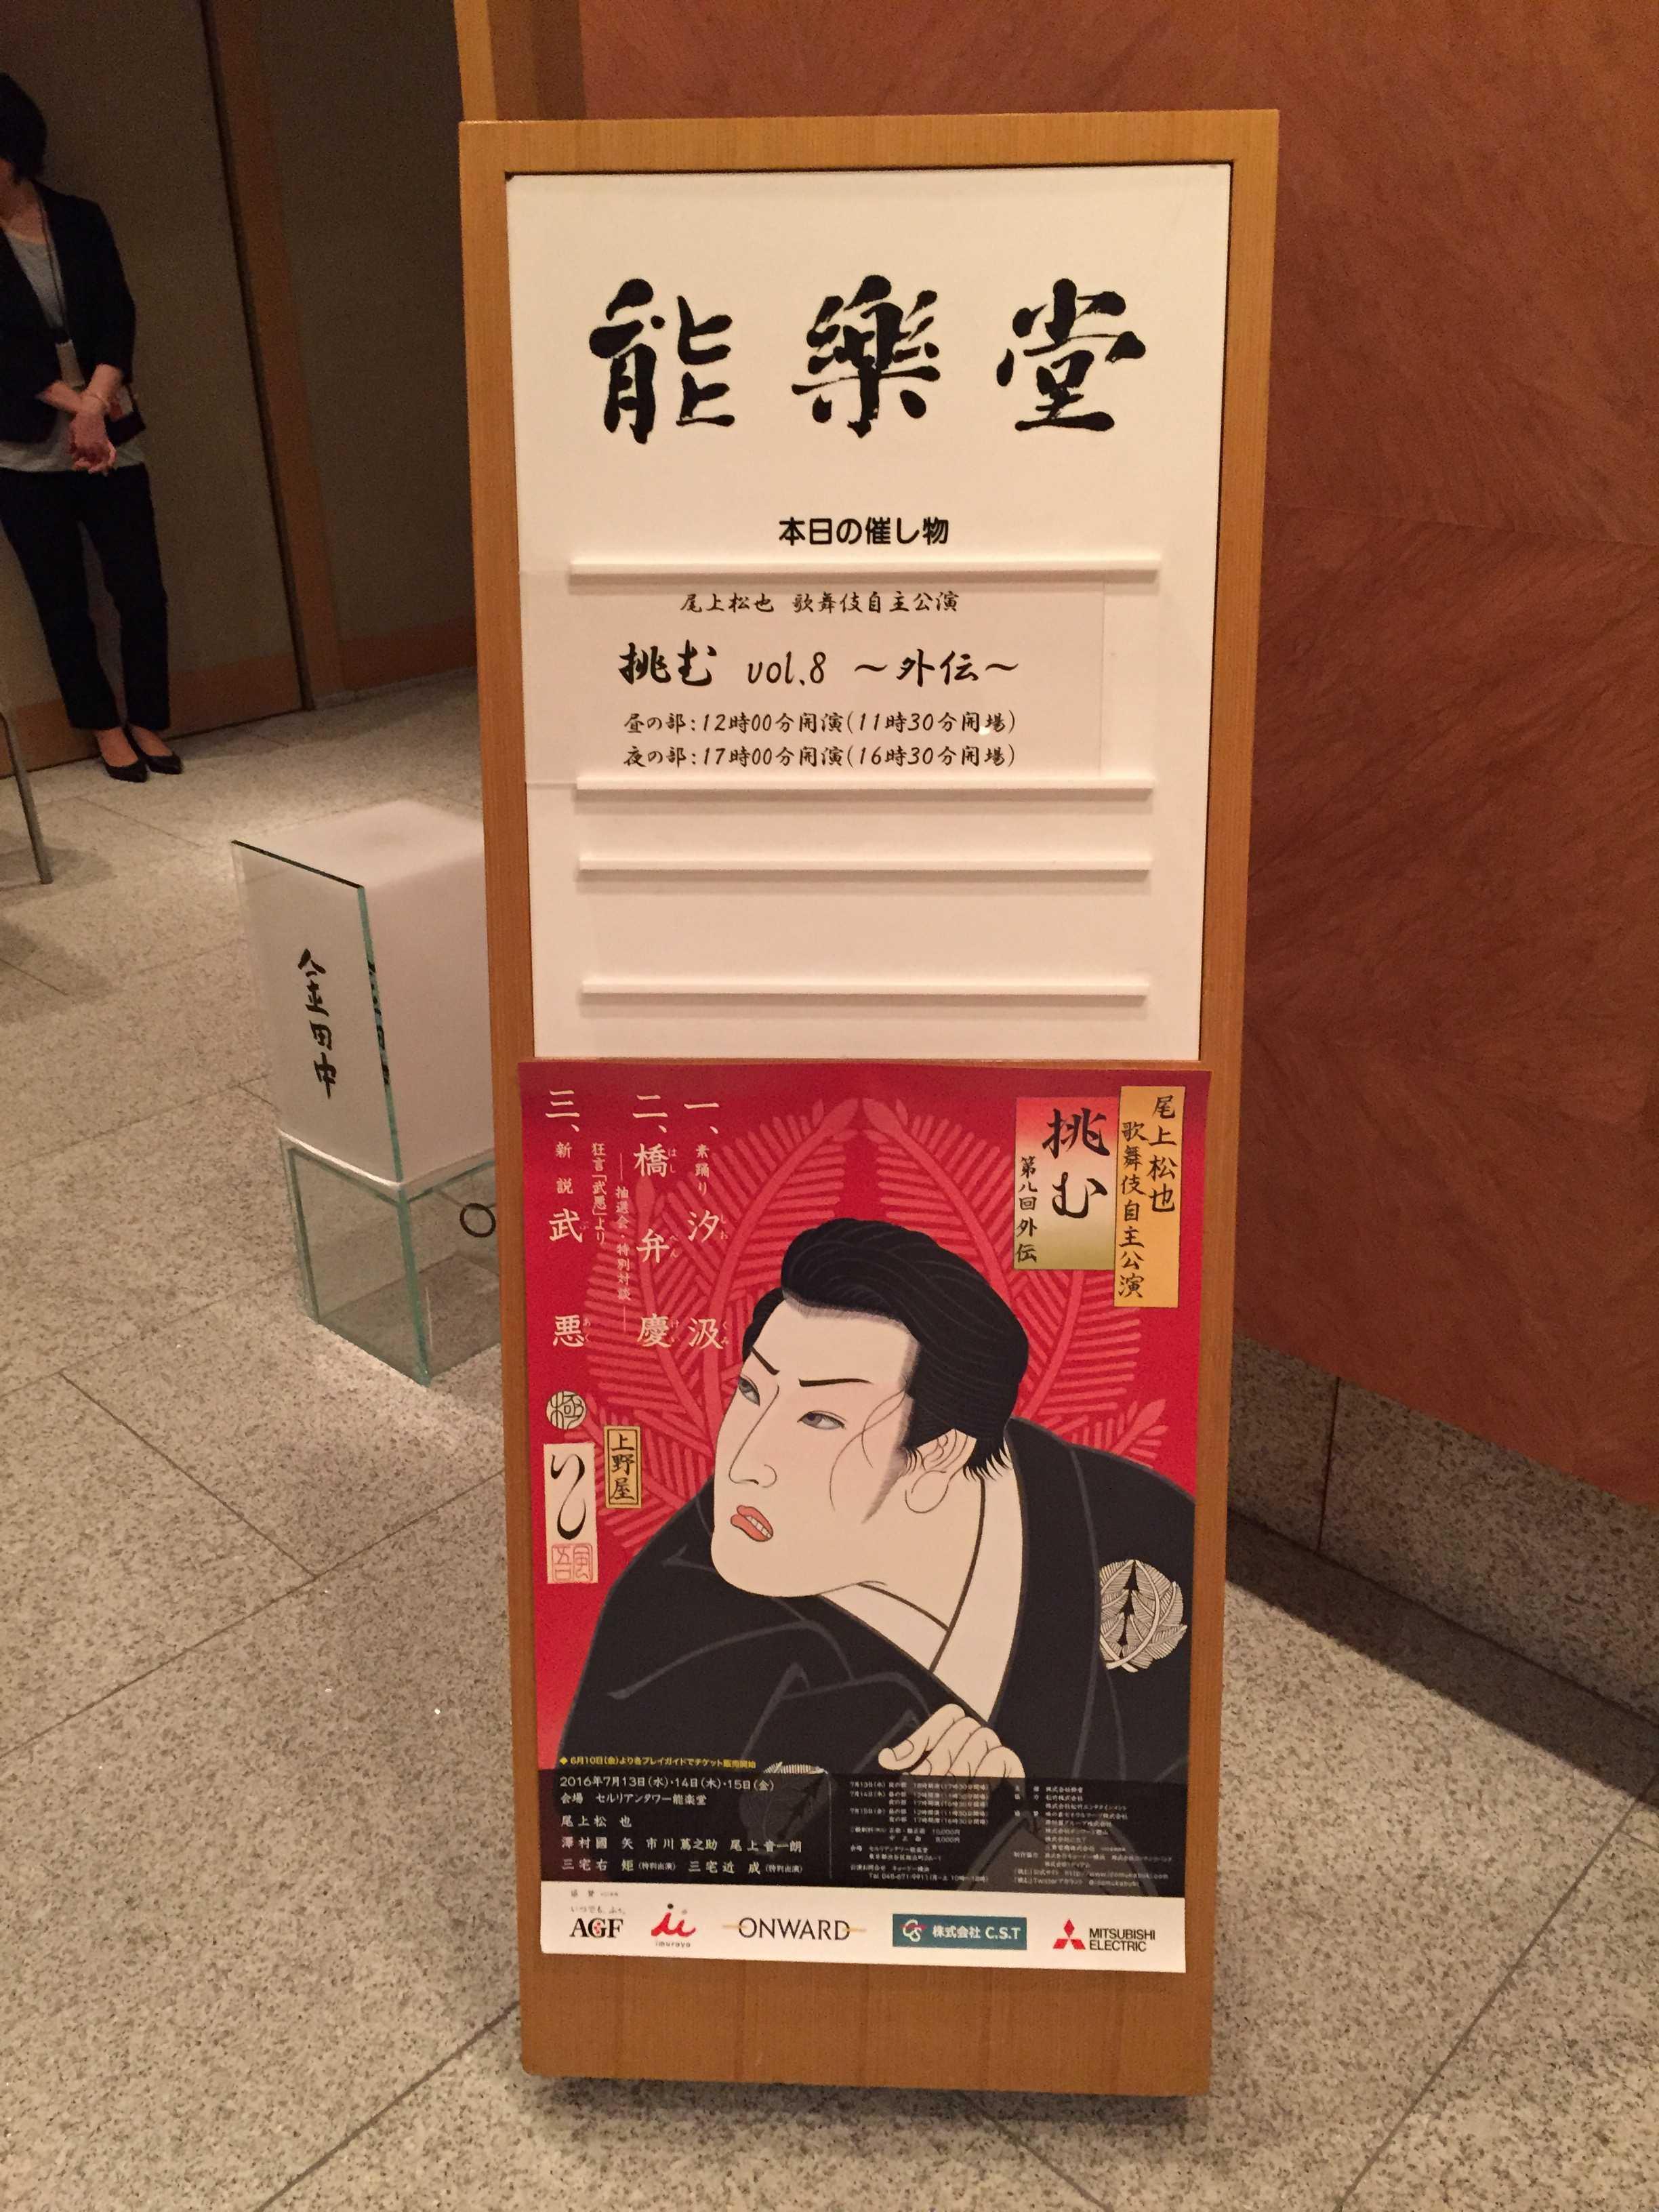 挑む -尾上松也 歌舞伎自主公演 公演ポスターの浮世絵